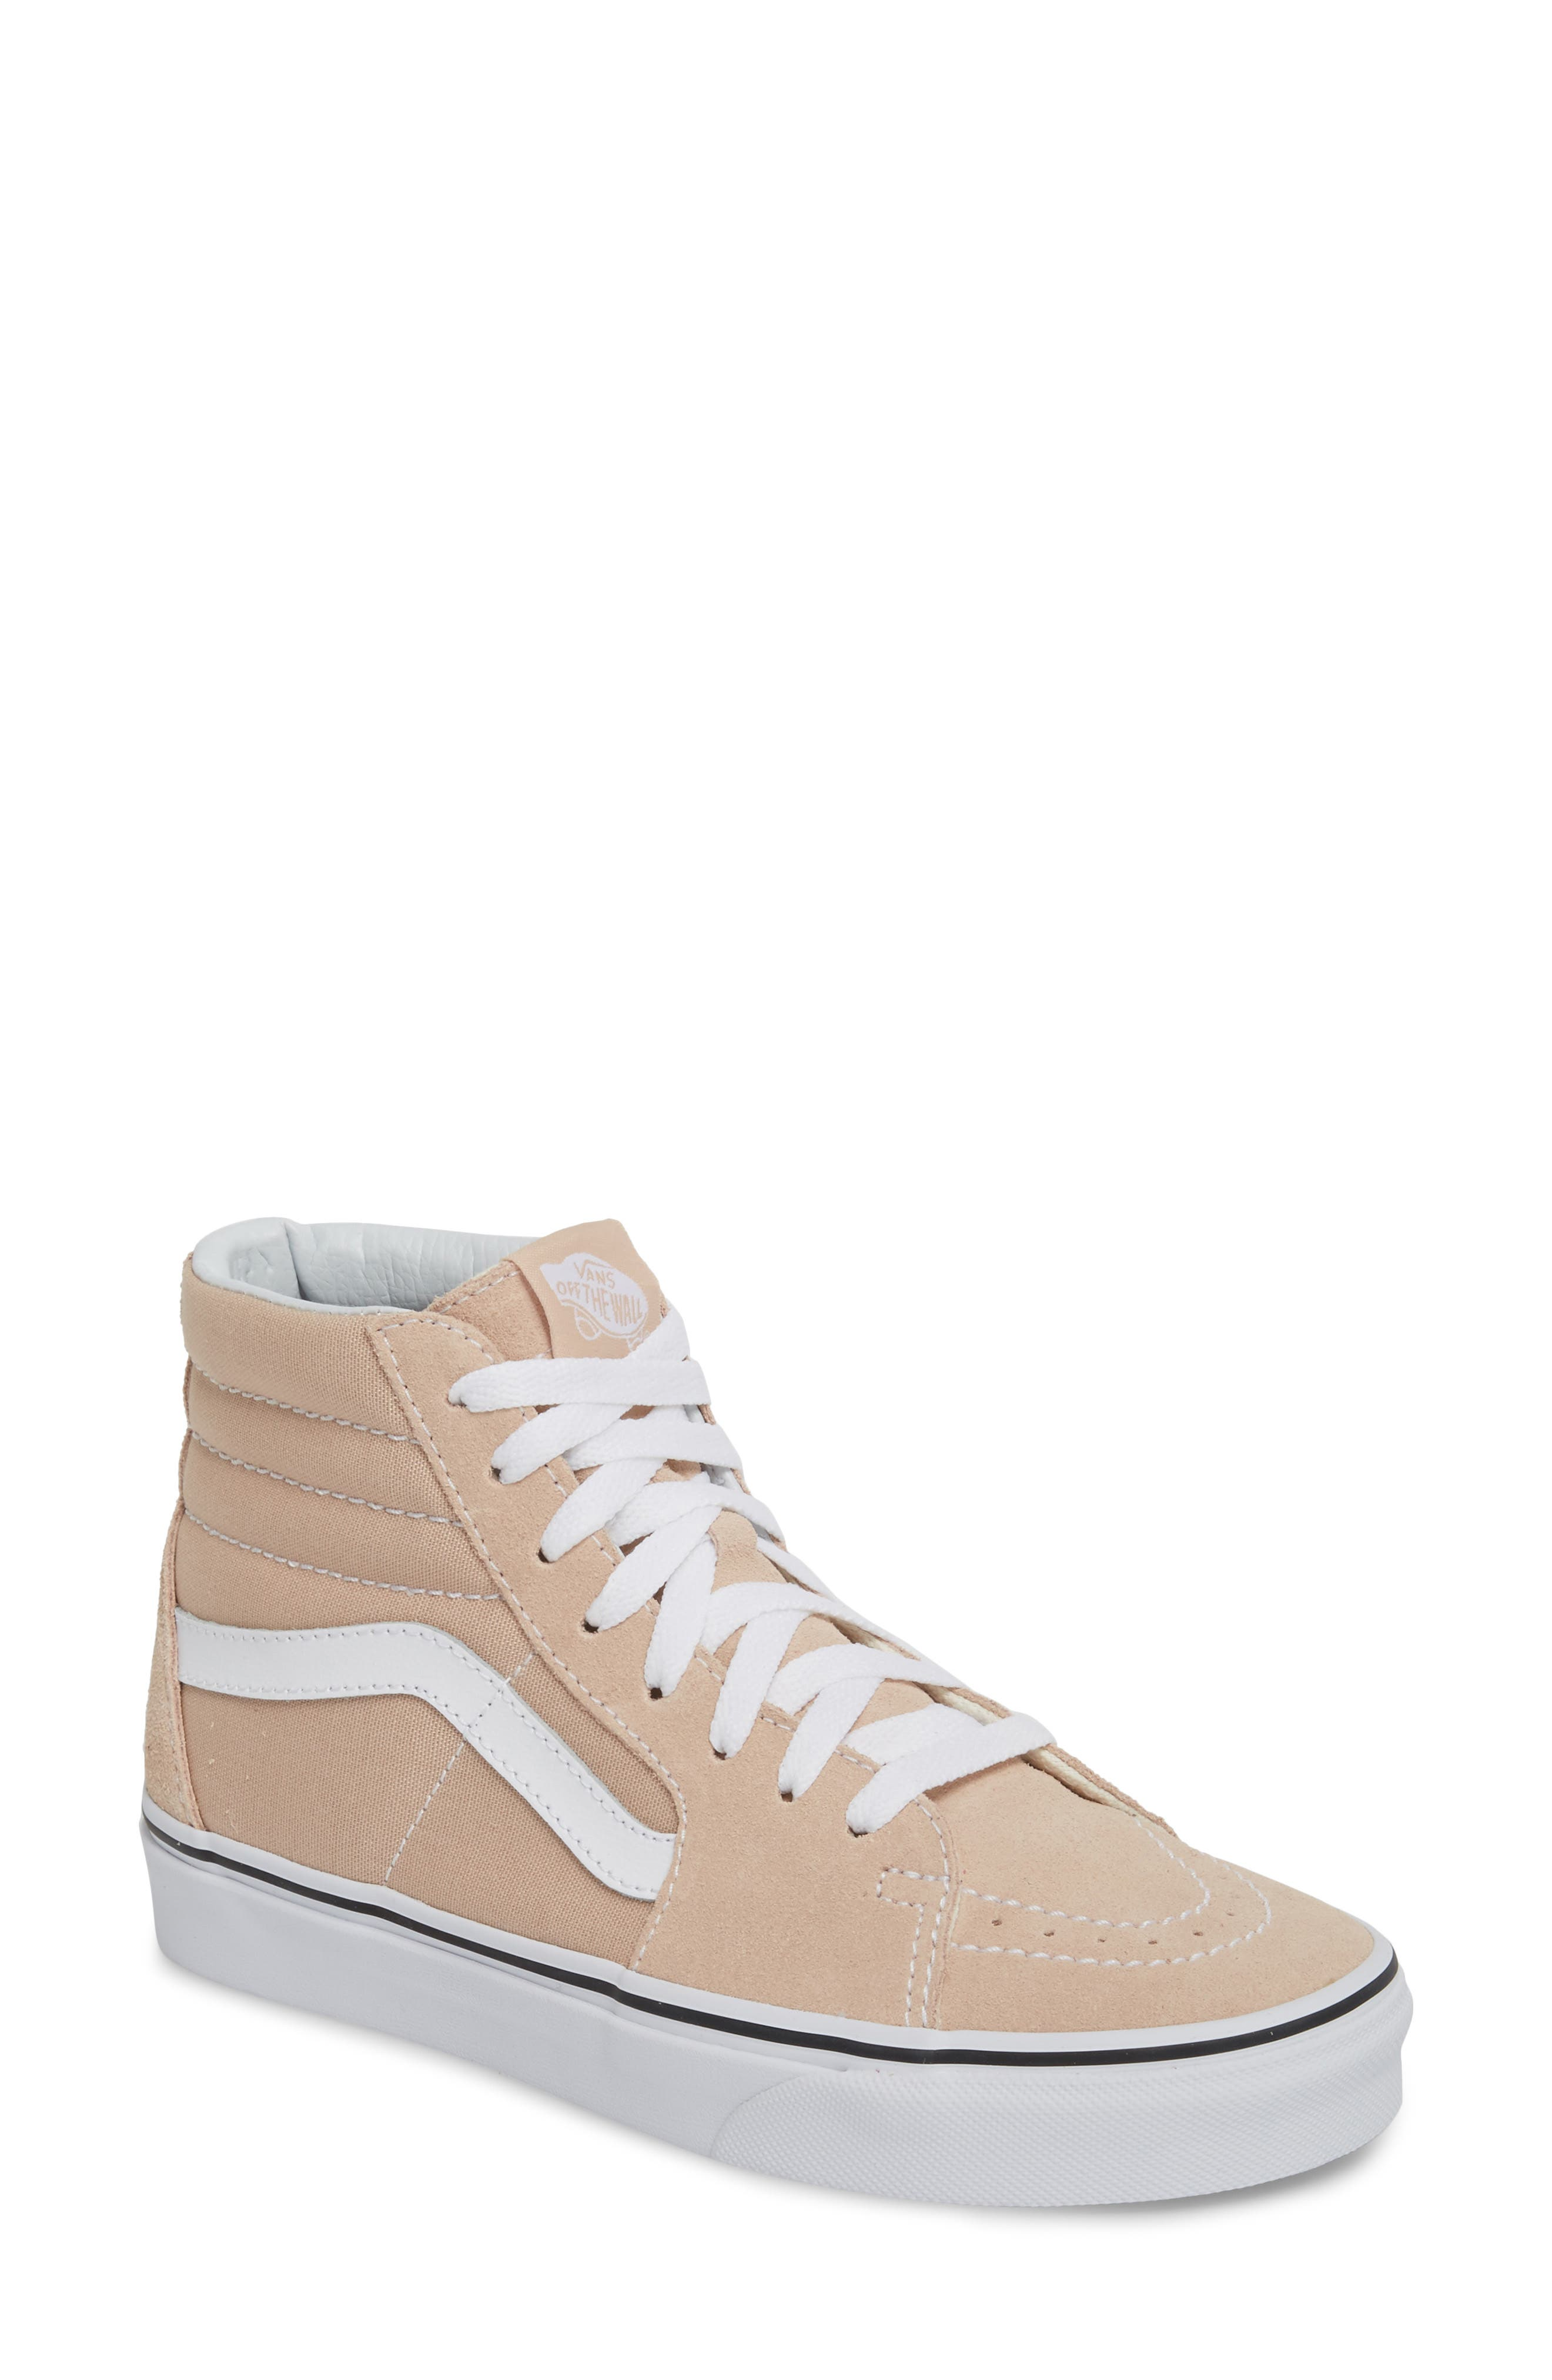 'Sk8-Hi Slim' Sneaker,                         Main,                         color, Frappe/ True White